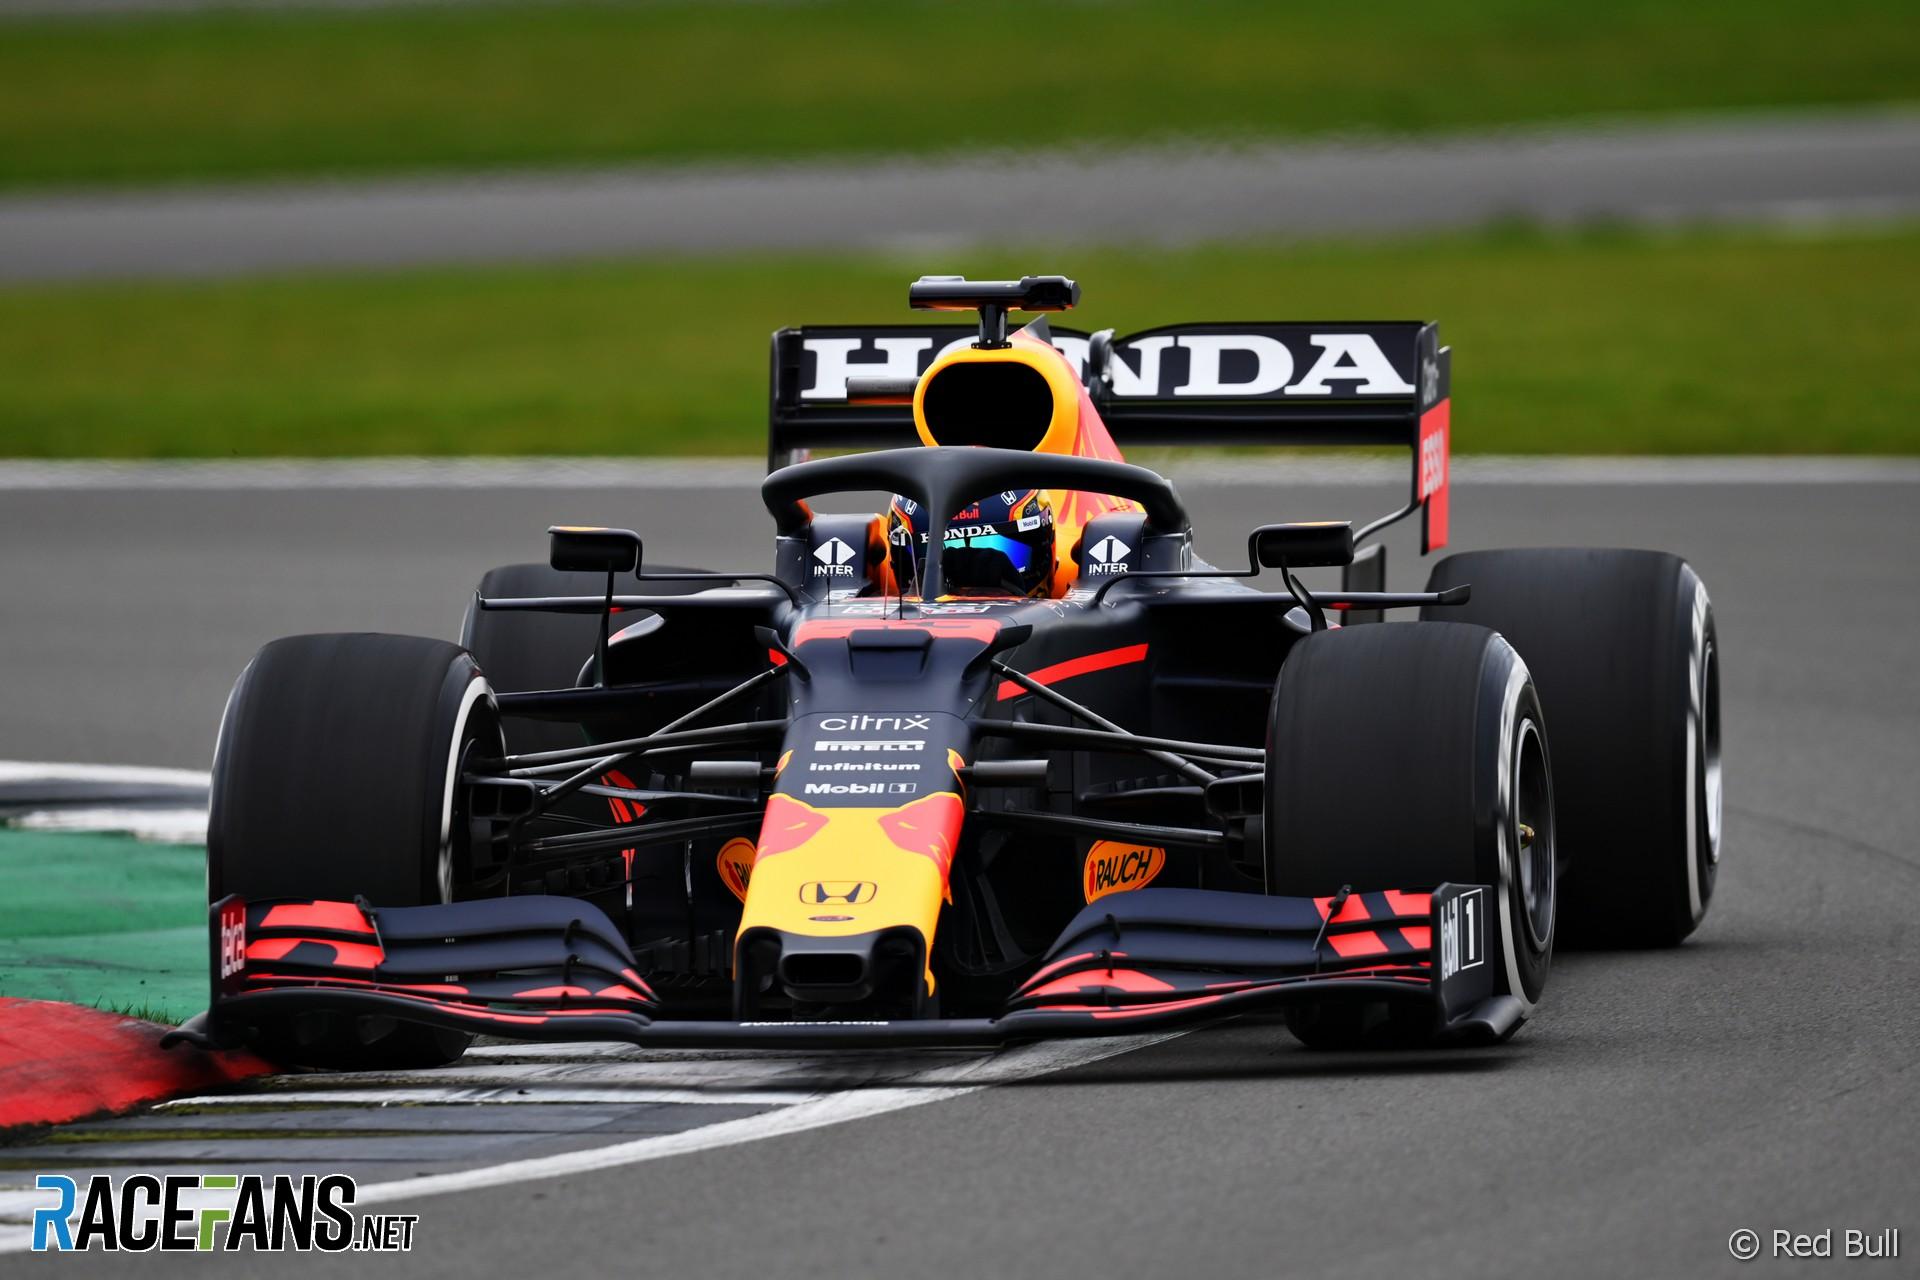 Alexander Albon, Red Bull, Silverstone, 2021